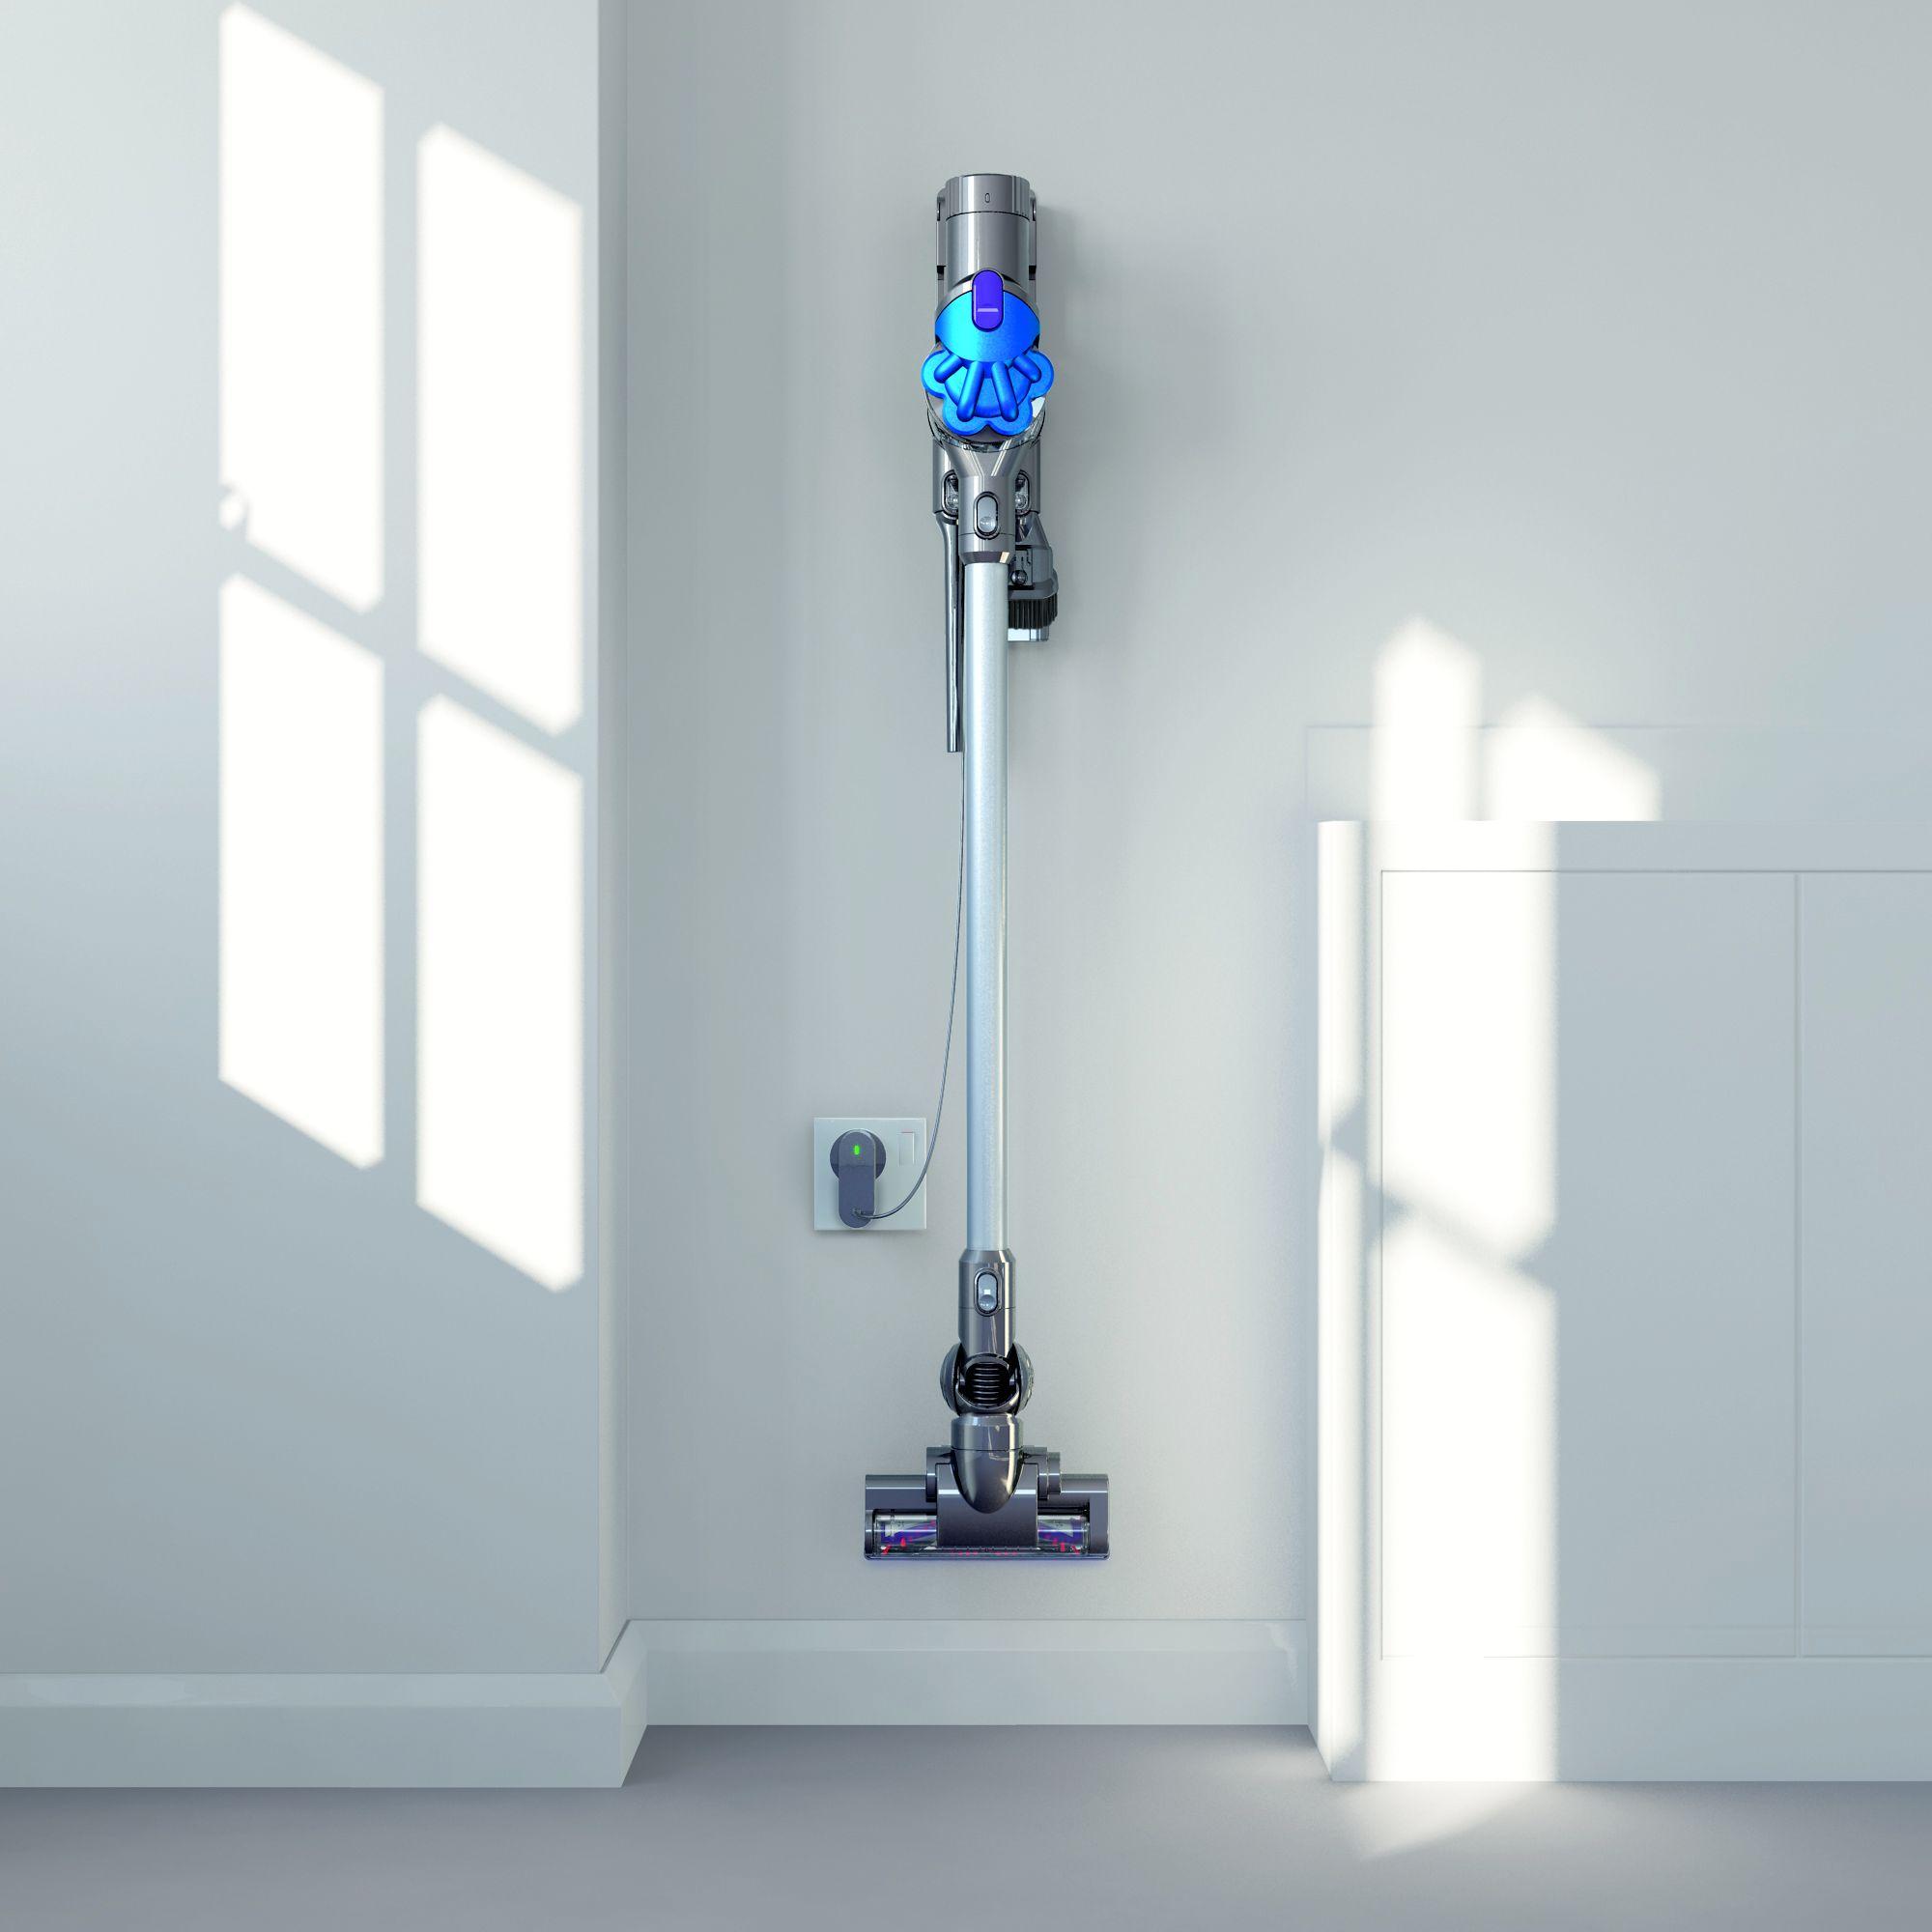 dyson dc35 wandhalterung akku handstaubsauger dyson digital slim dc35 multi floor modernste. Black Bedroom Furniture Sets. Home Design Ideas